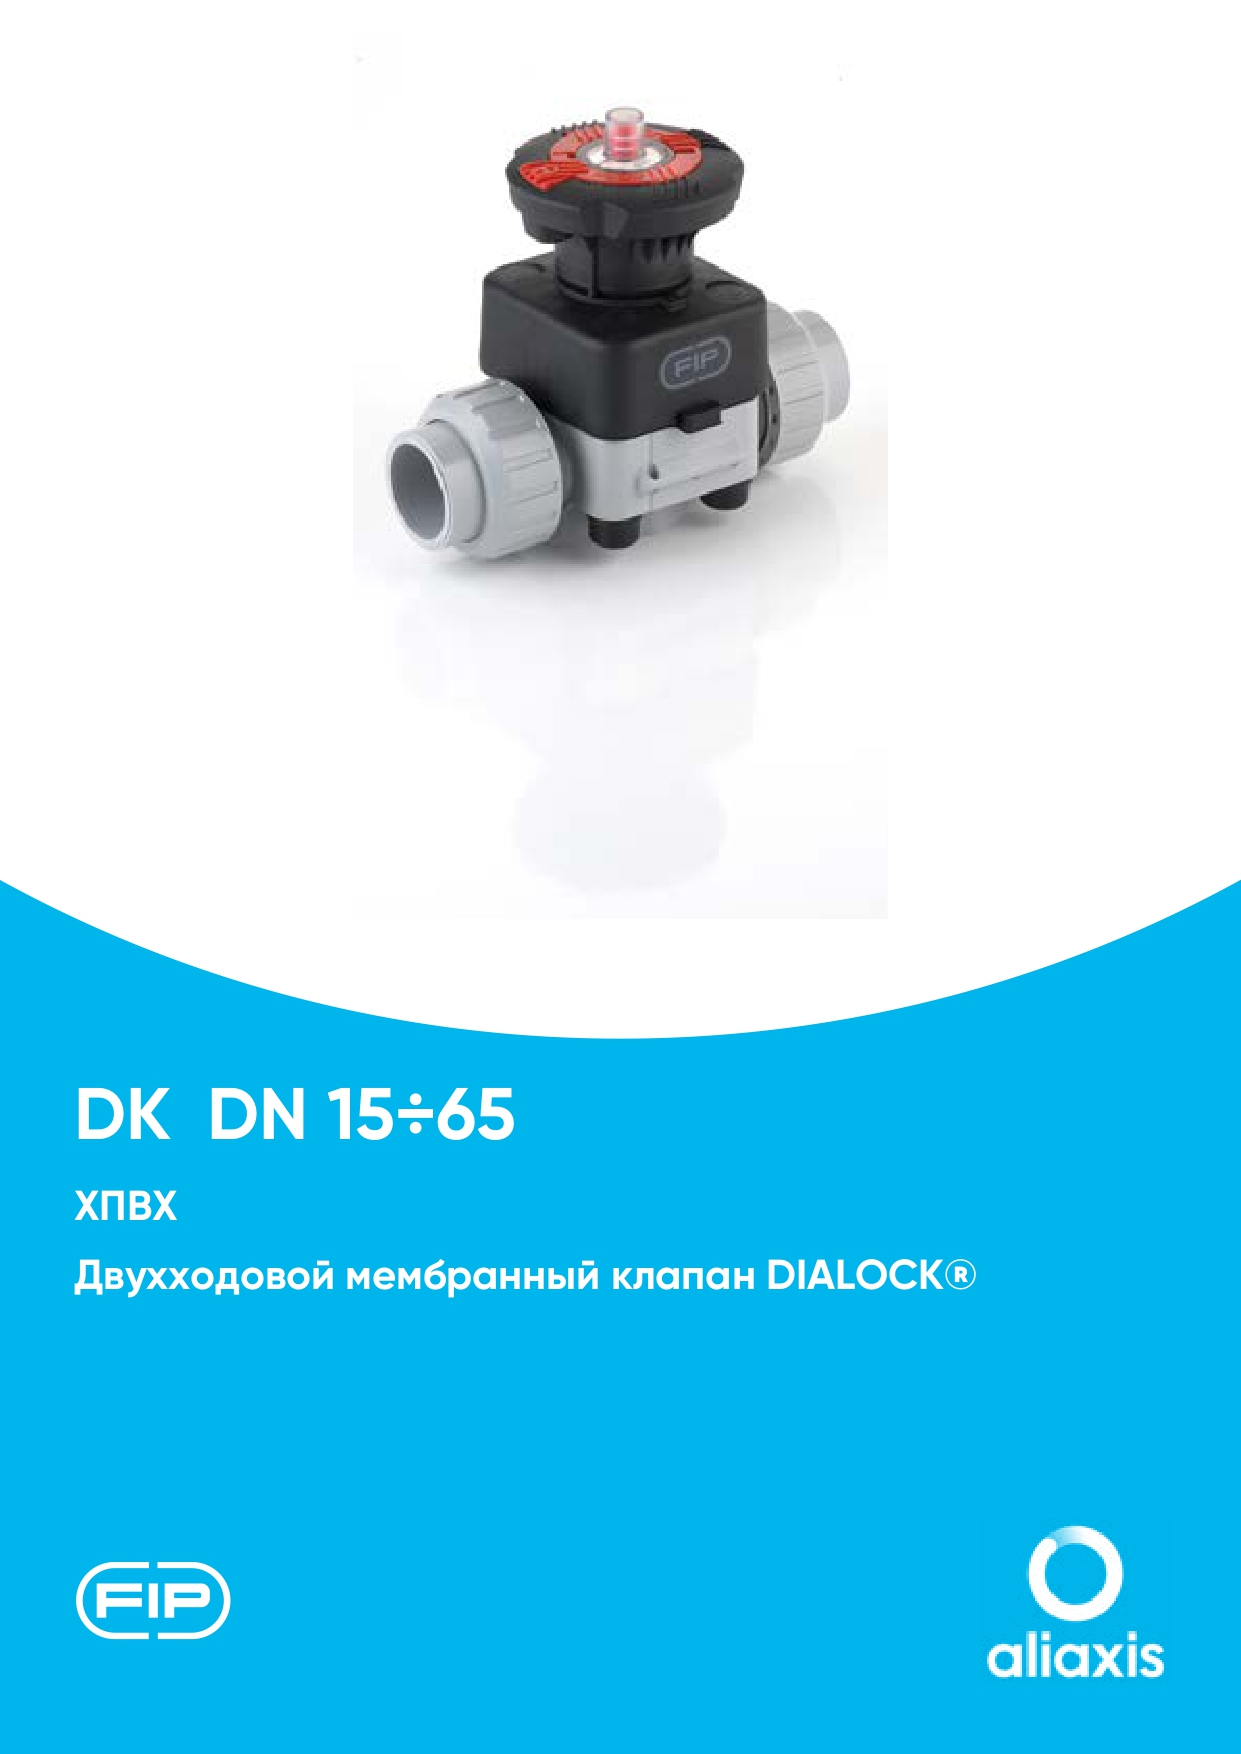 Мембранные клапаны DK DN15-65 из ХПВХ